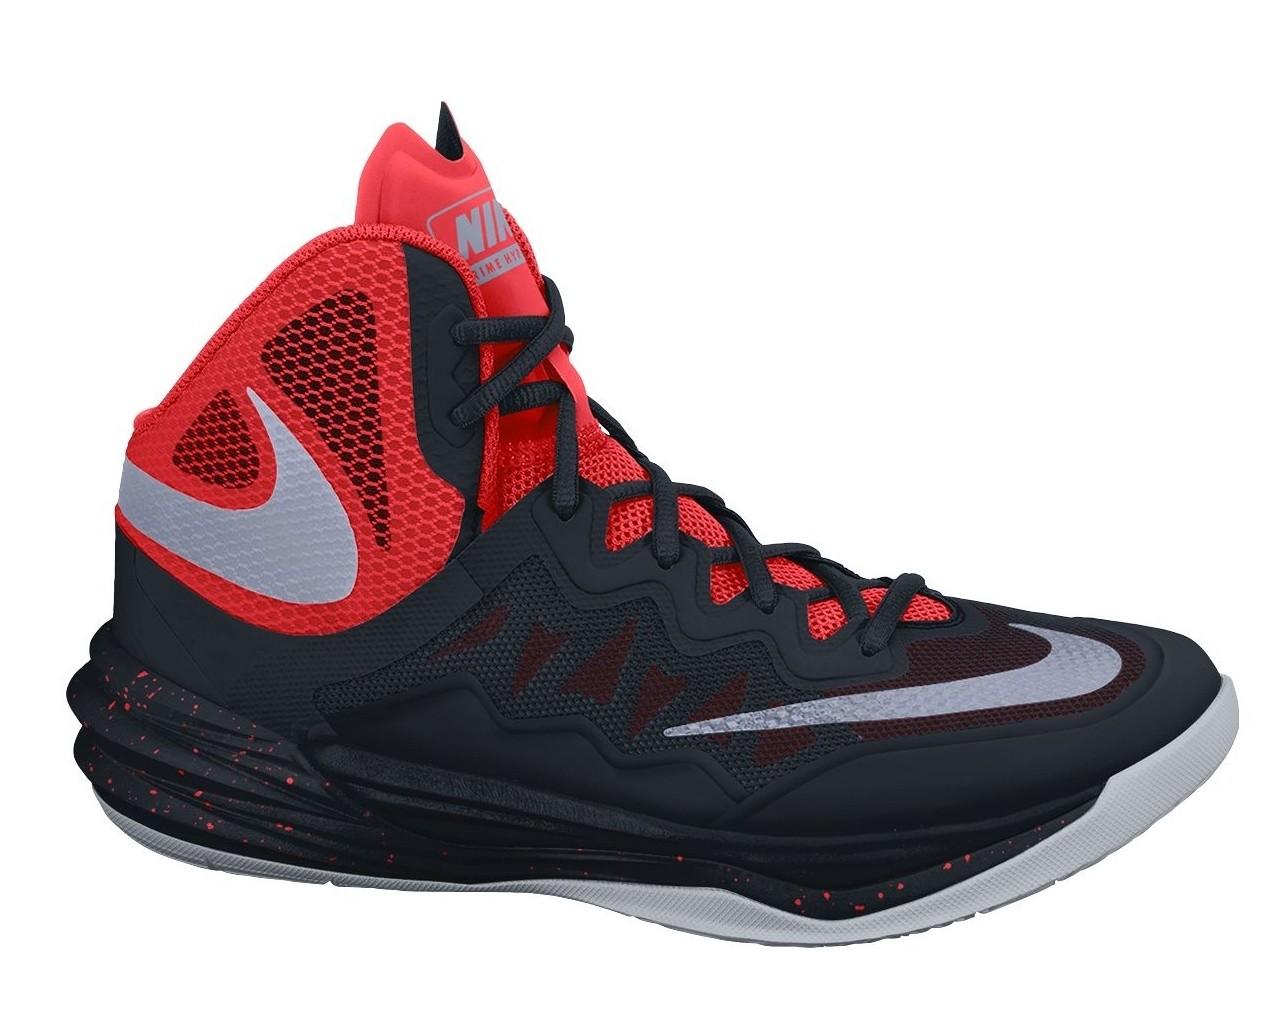 00c0bcefc13 Pánské basketbalové boty Nike PRIME HYPE DF II